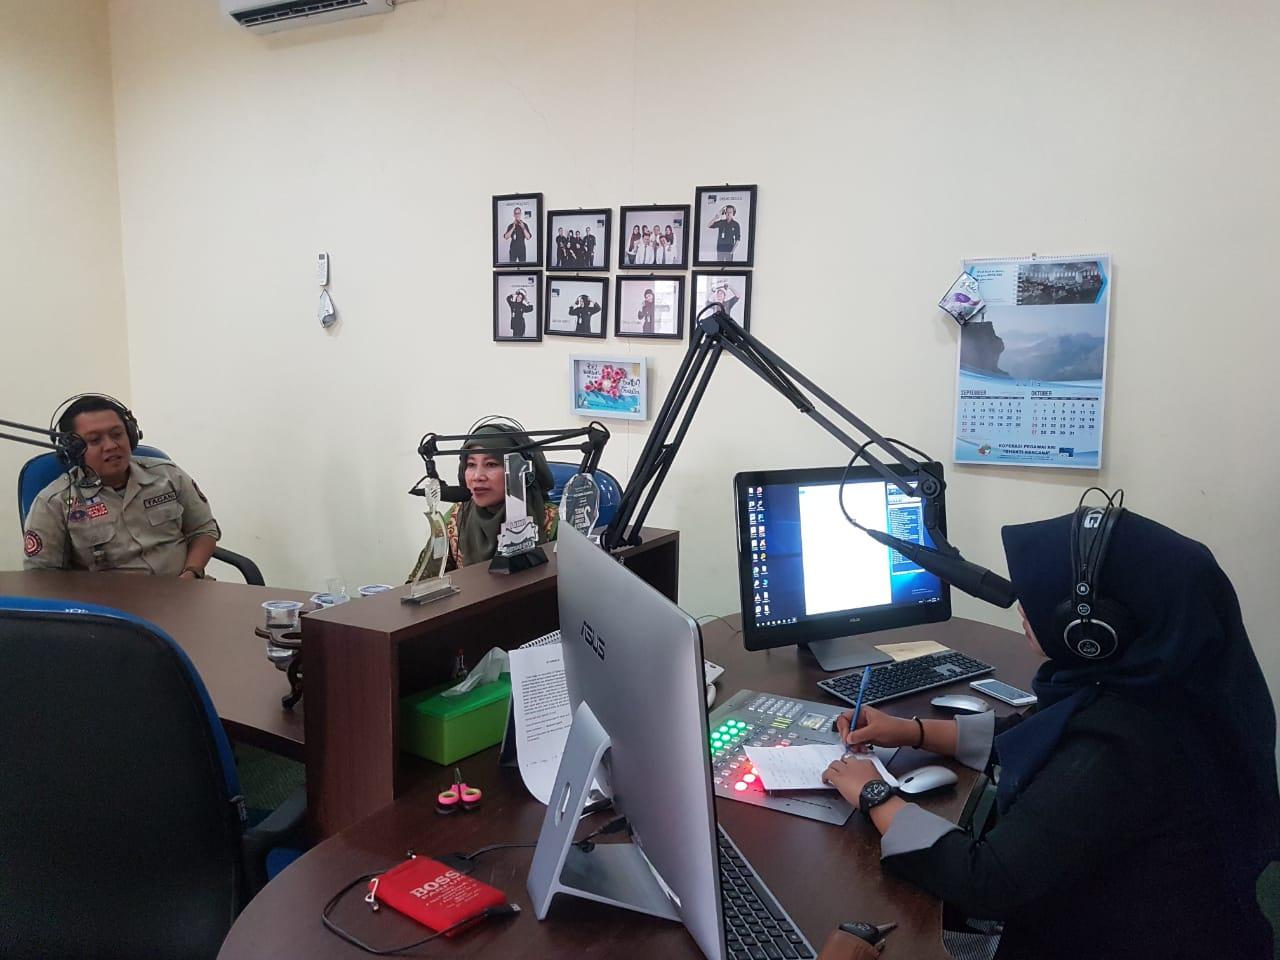 Dialog Interaktif dengan Program Kentongan, Narasumber Kabid Linjamsos Dinas Sosial Kota Serang dengan topik :Sosialisasi Kampung Siaga Bencana di RRI Banten 94,9 FM